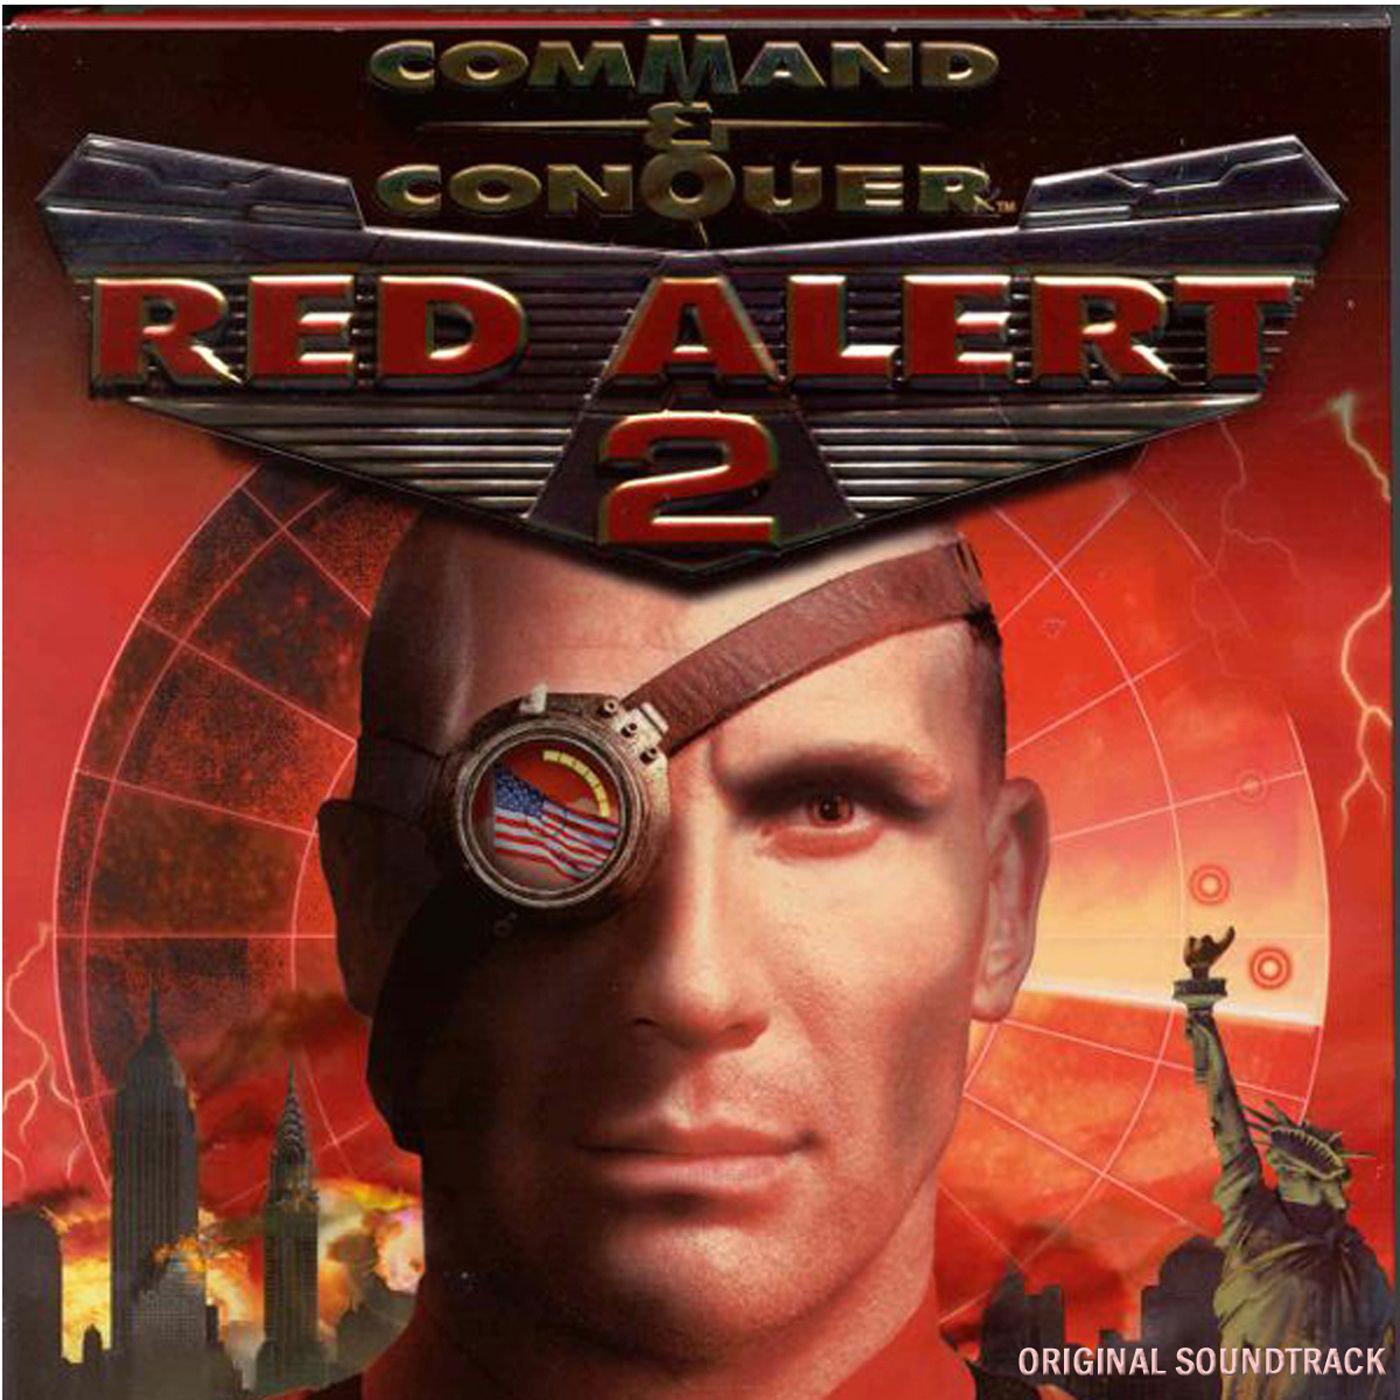 скачать музыку из red alert 2